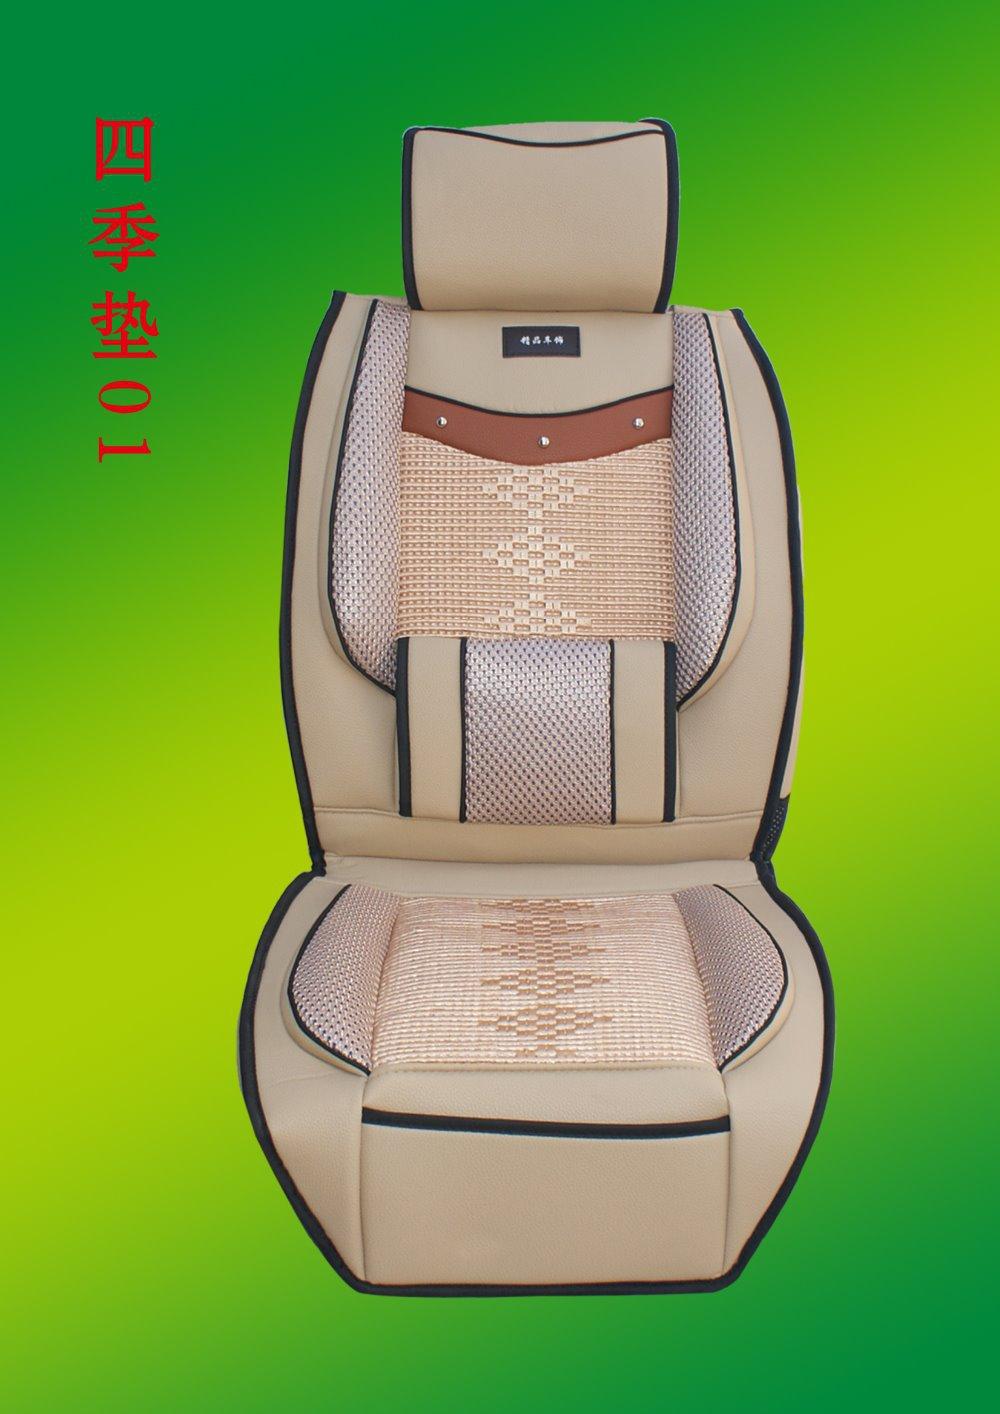 universal car seat Cover Toyota Corolla Camry Rav4 Auris Prius Yalis Avensis 2014 capa banco carro car accessories(China (Mainland))